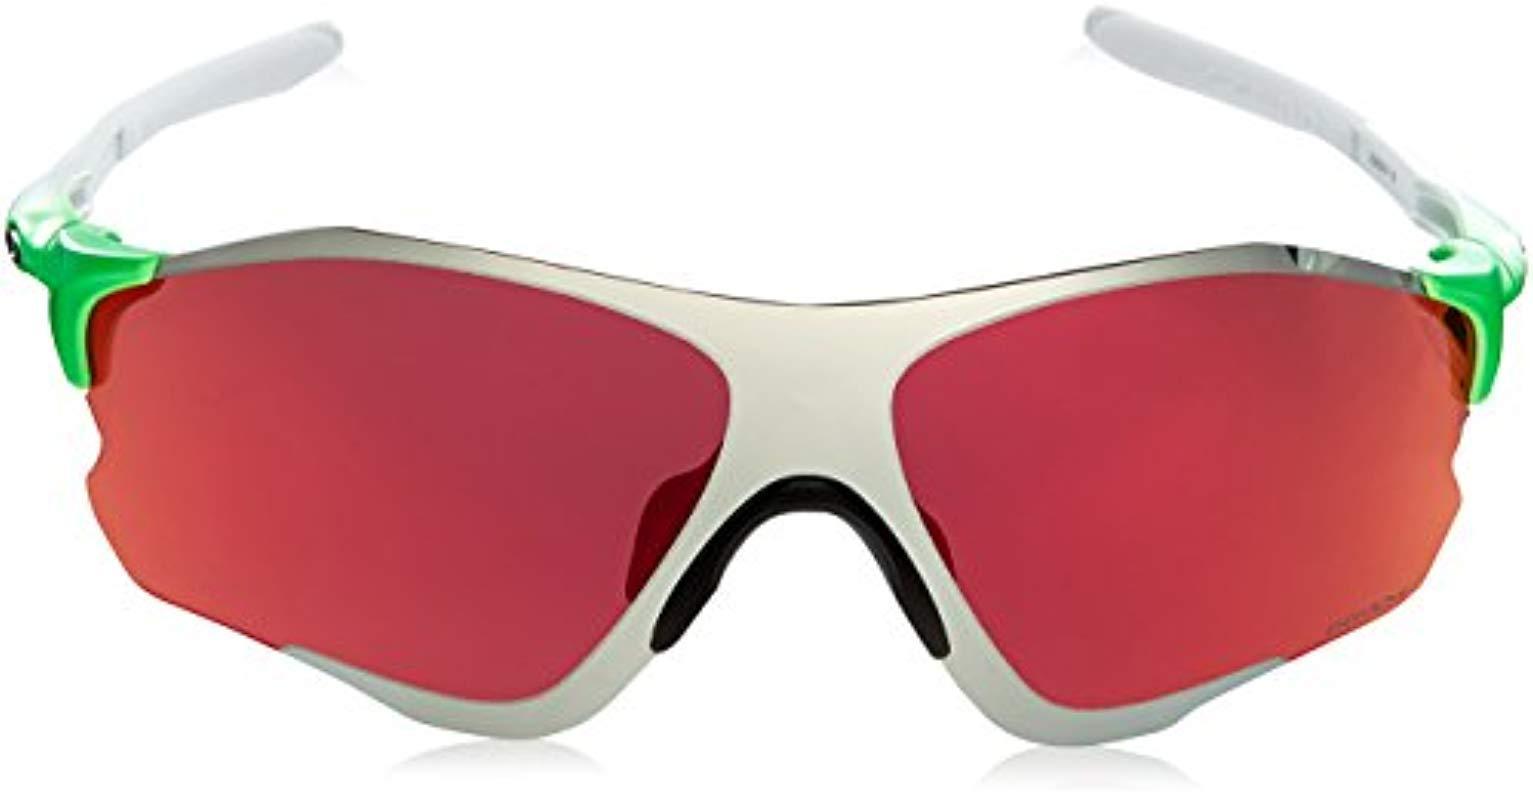 ff46dae965 Oakley - Green Evzero Prizm Golf Sunglasses for Men - Lyst. View fullscreen